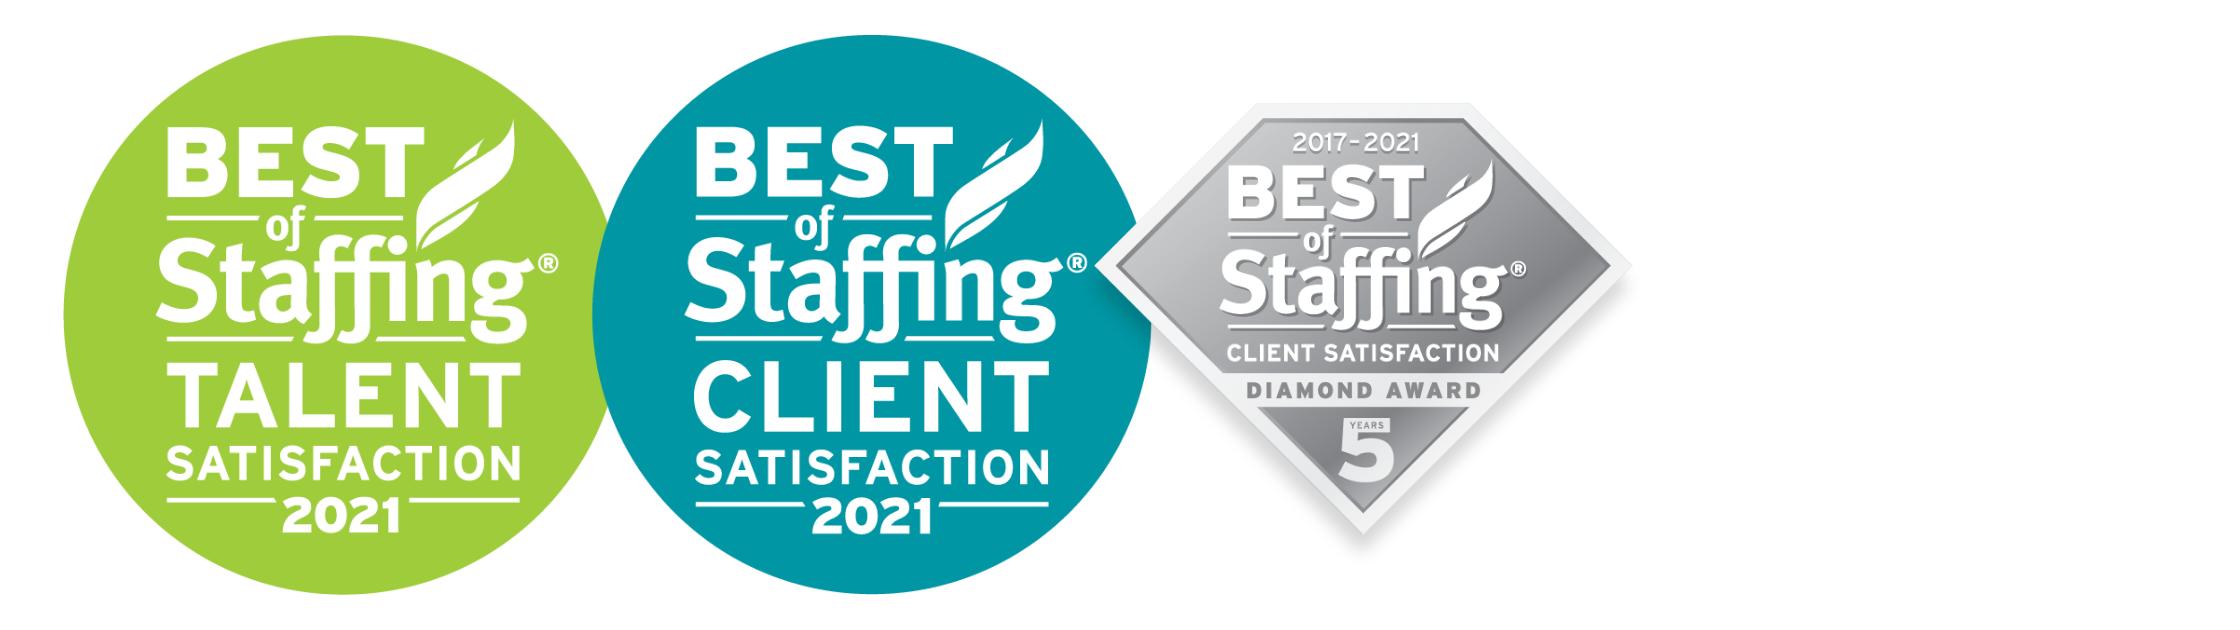 2021 Best of Staffing Blog Image